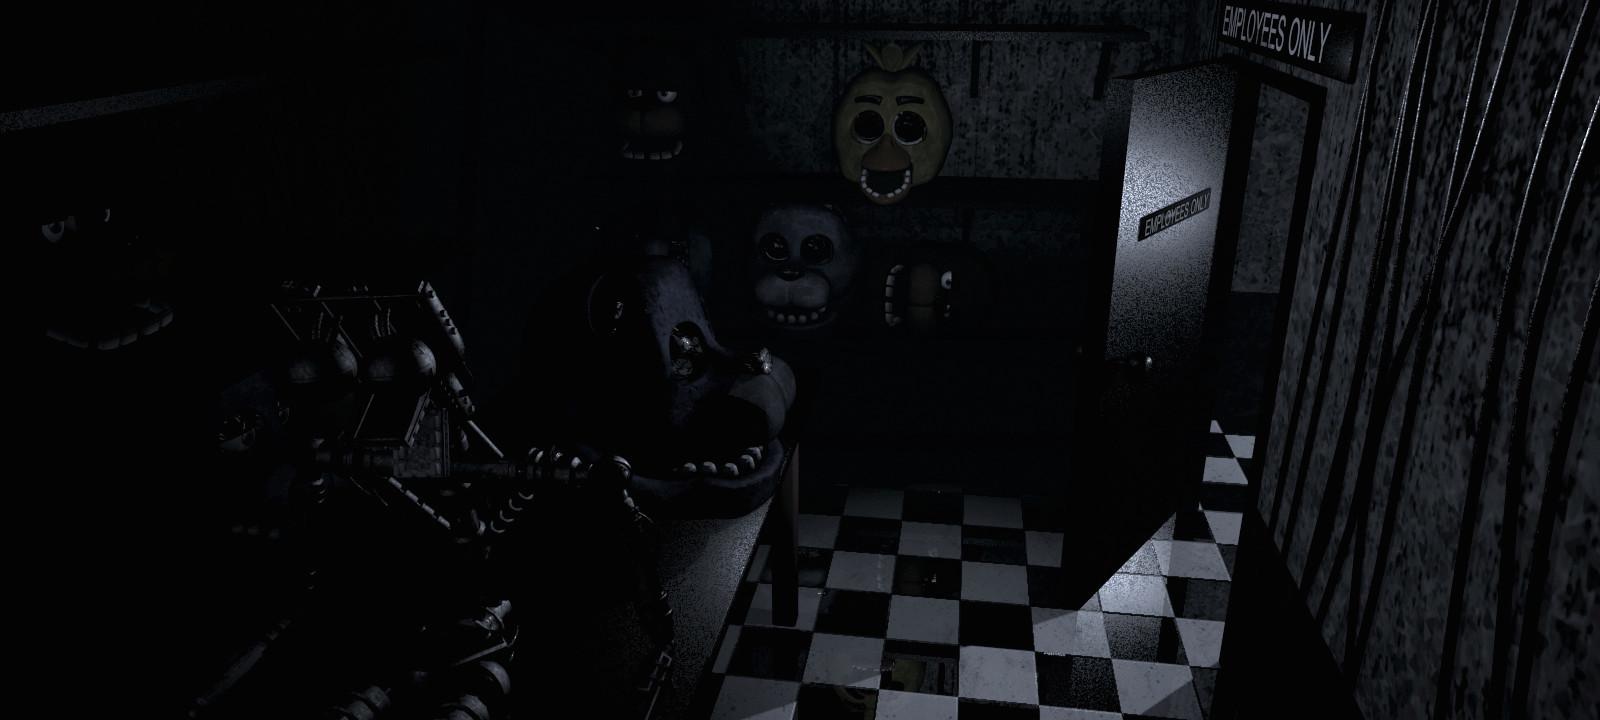 Endoskeletons | Five Nights at Freddy's Wiki | FANDOM